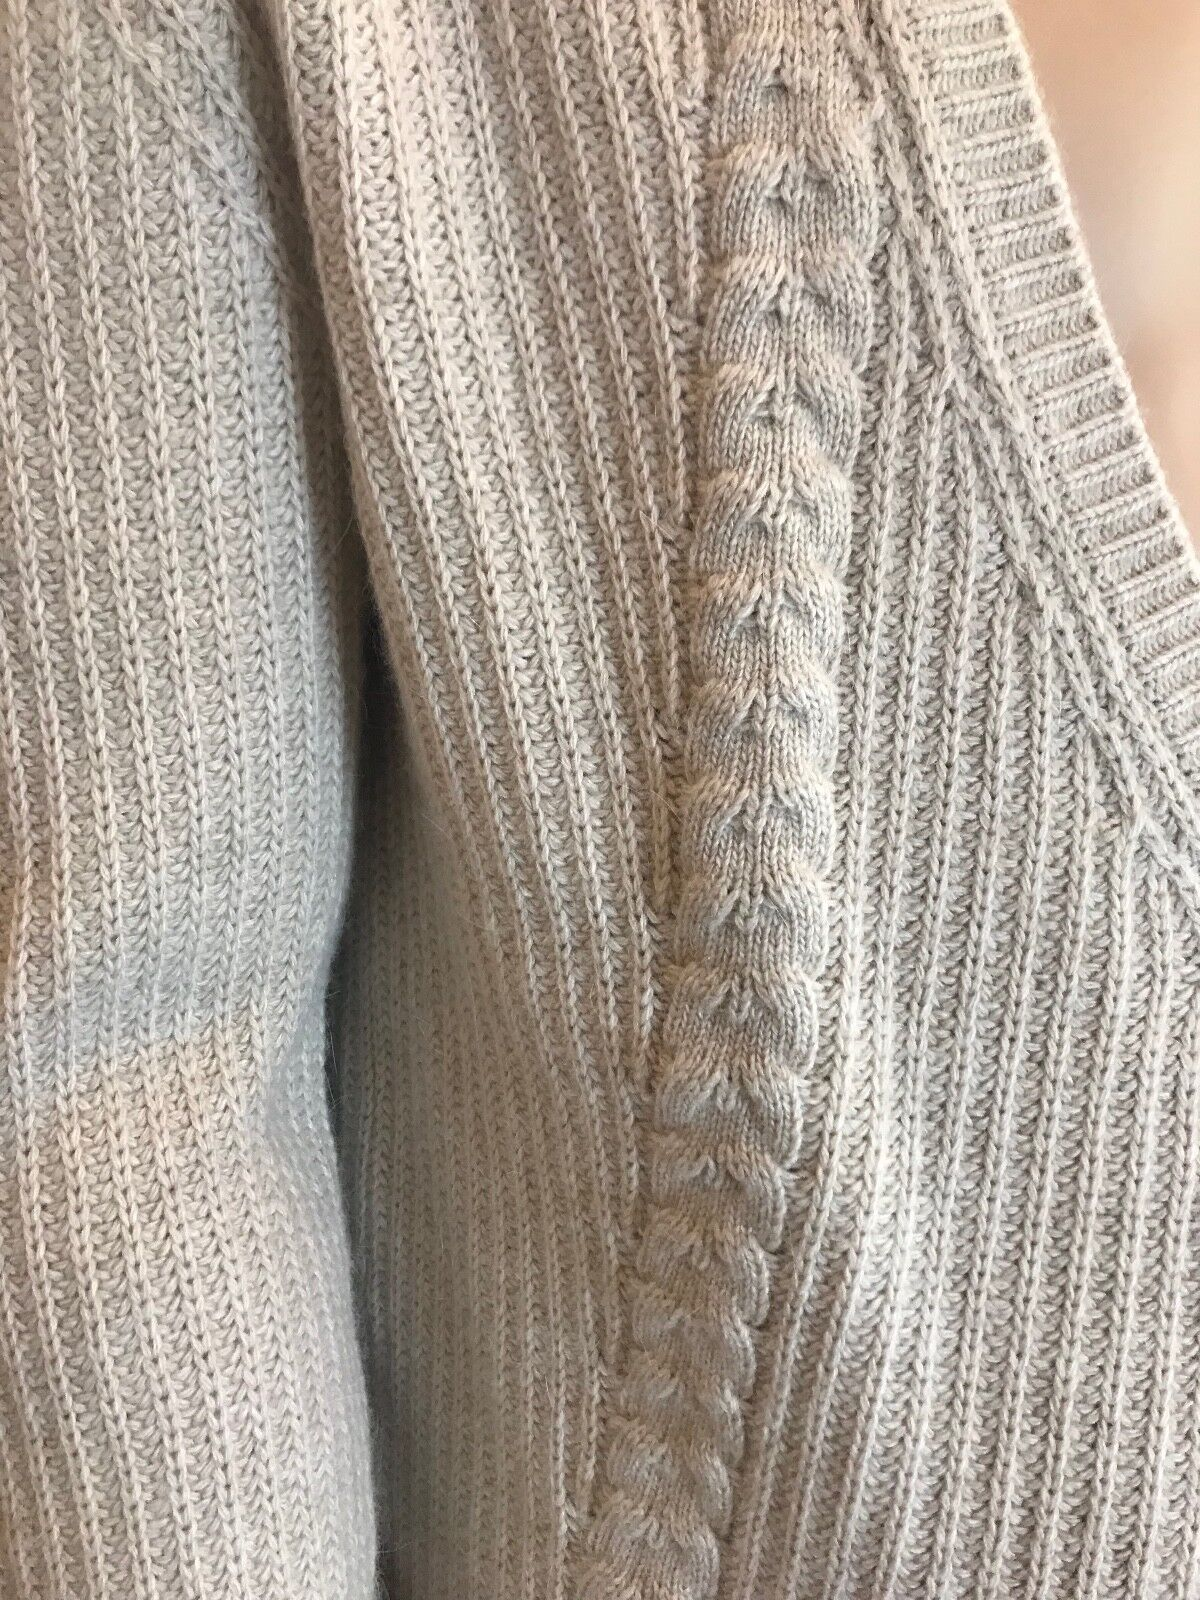 BNWT BNWT BNWT LACOSTE  Wool Cashmere Blend Cardigan Biscuit EU44 HALF PRICE   258f56